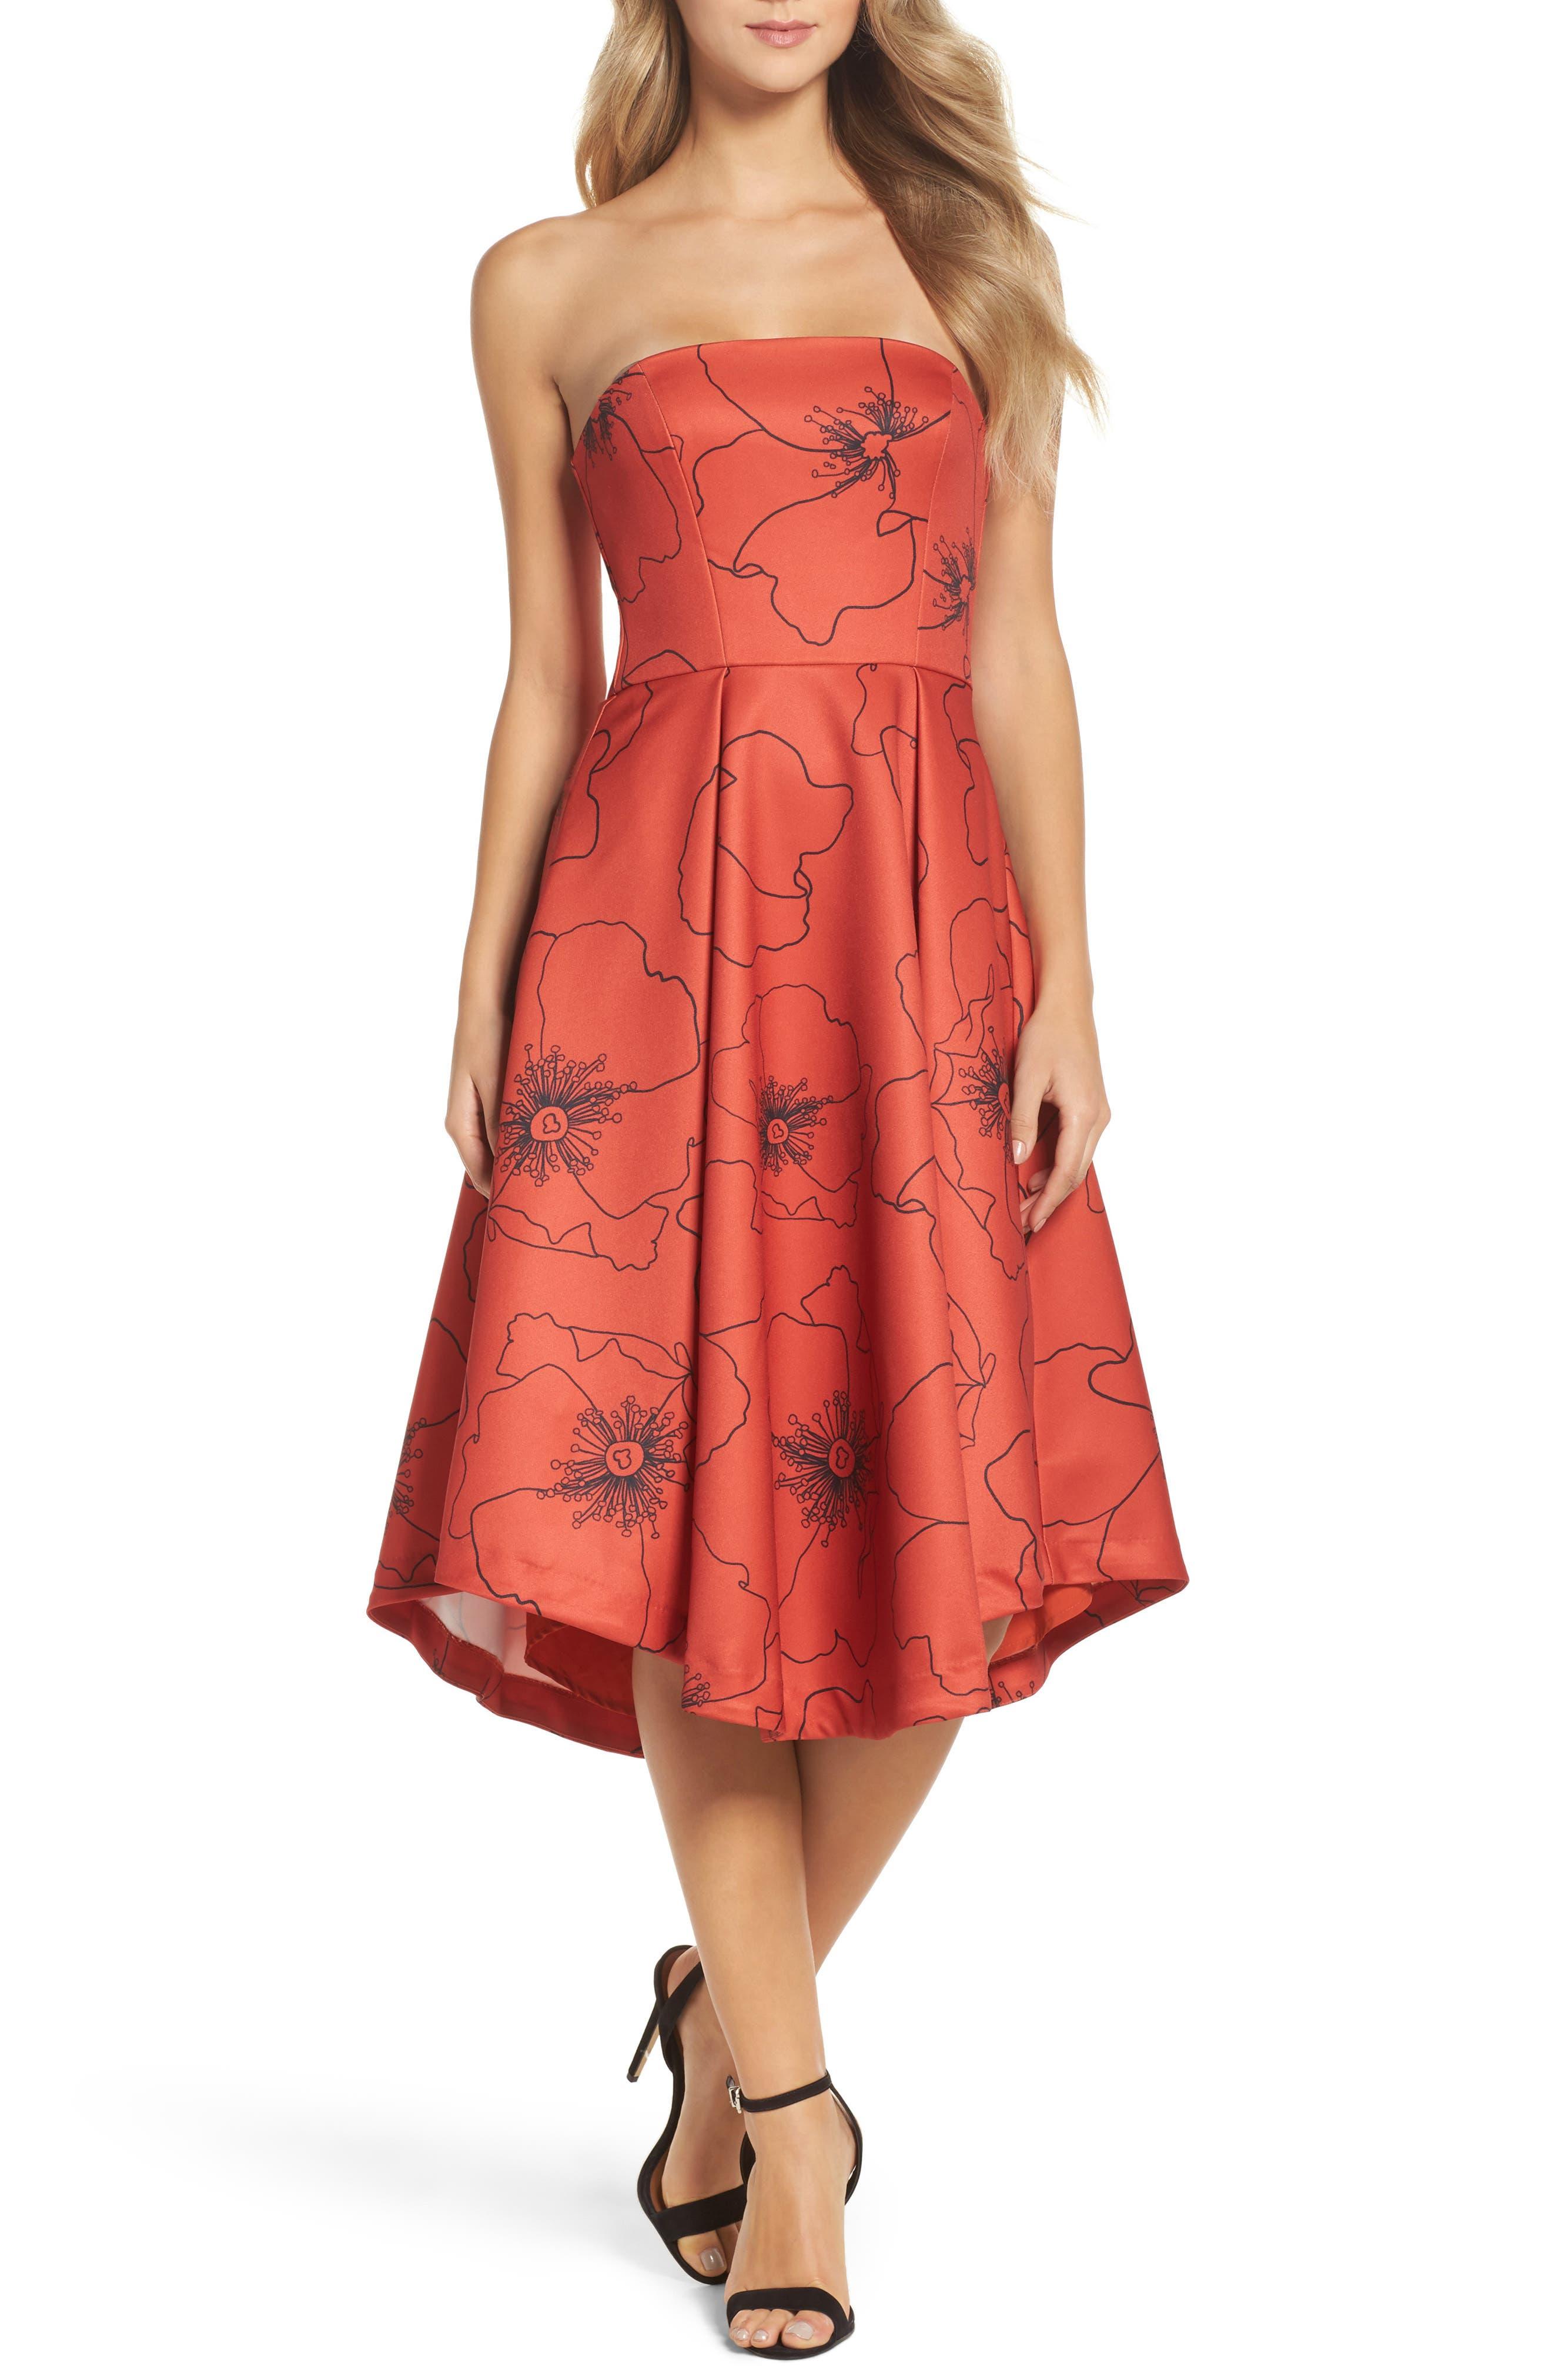 Burnt Fields Strapless Dress,                             Main thumbnail 1, color,                             606